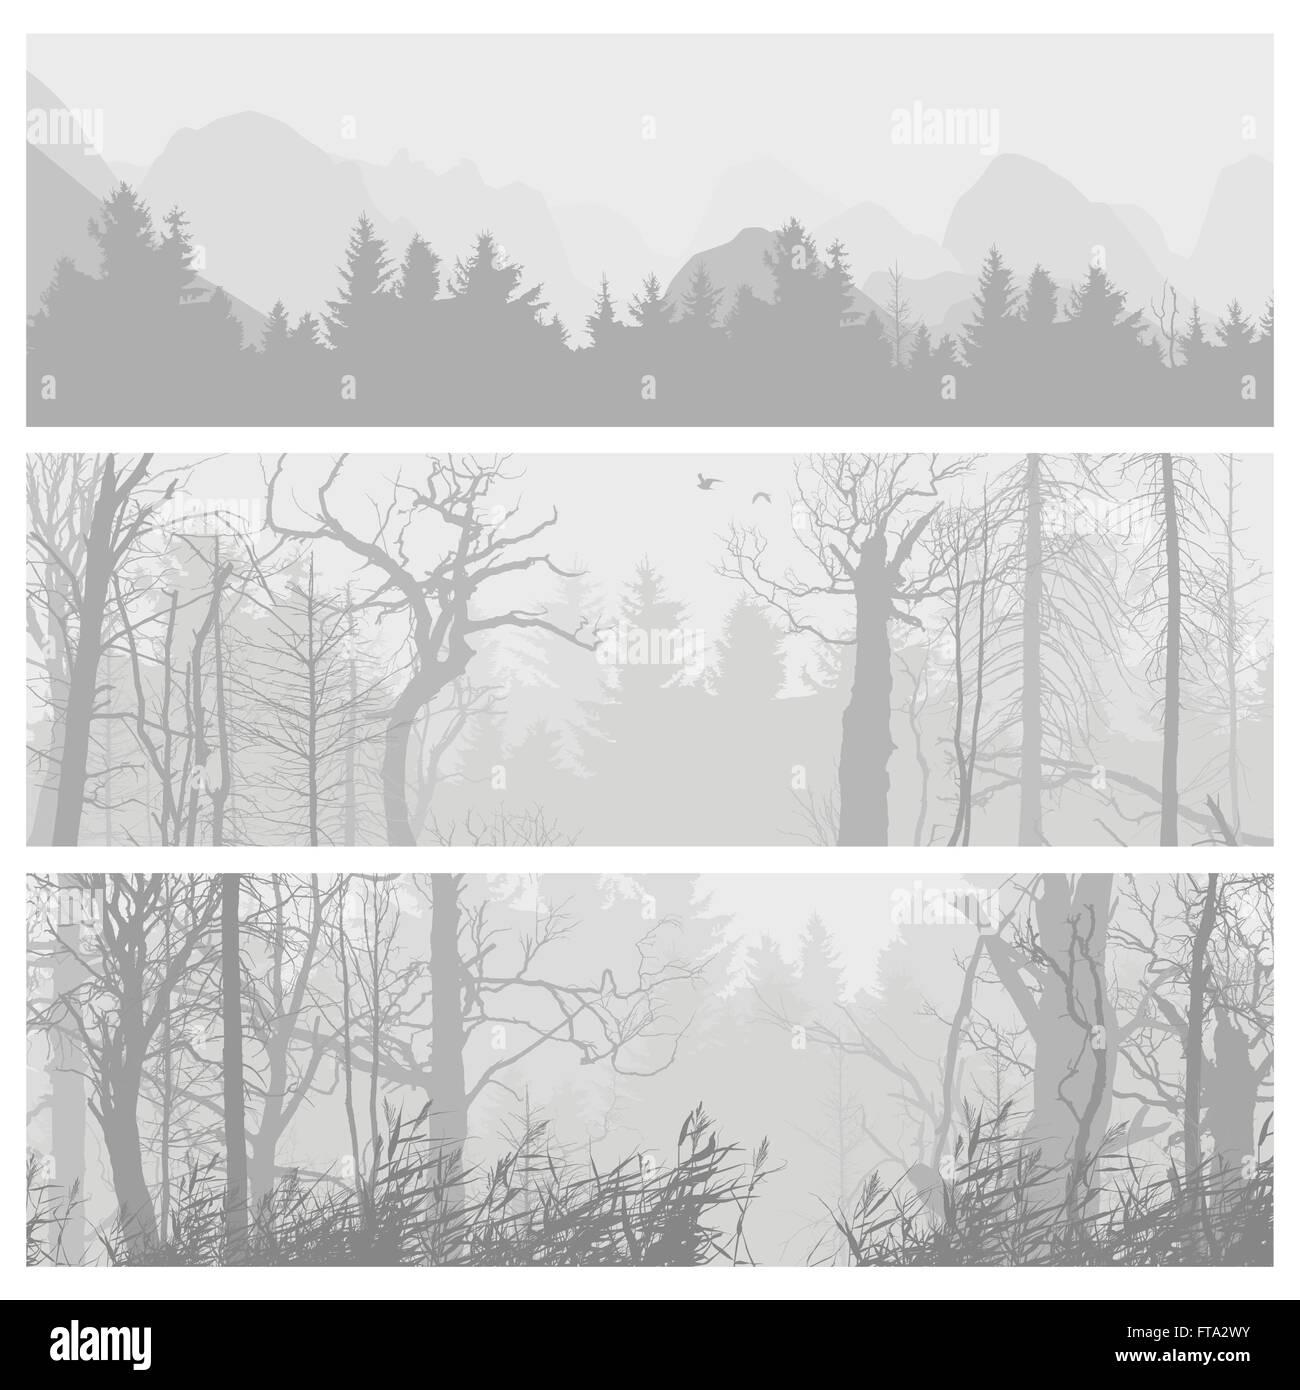 wild forest horizontal banners stock vector art illustration